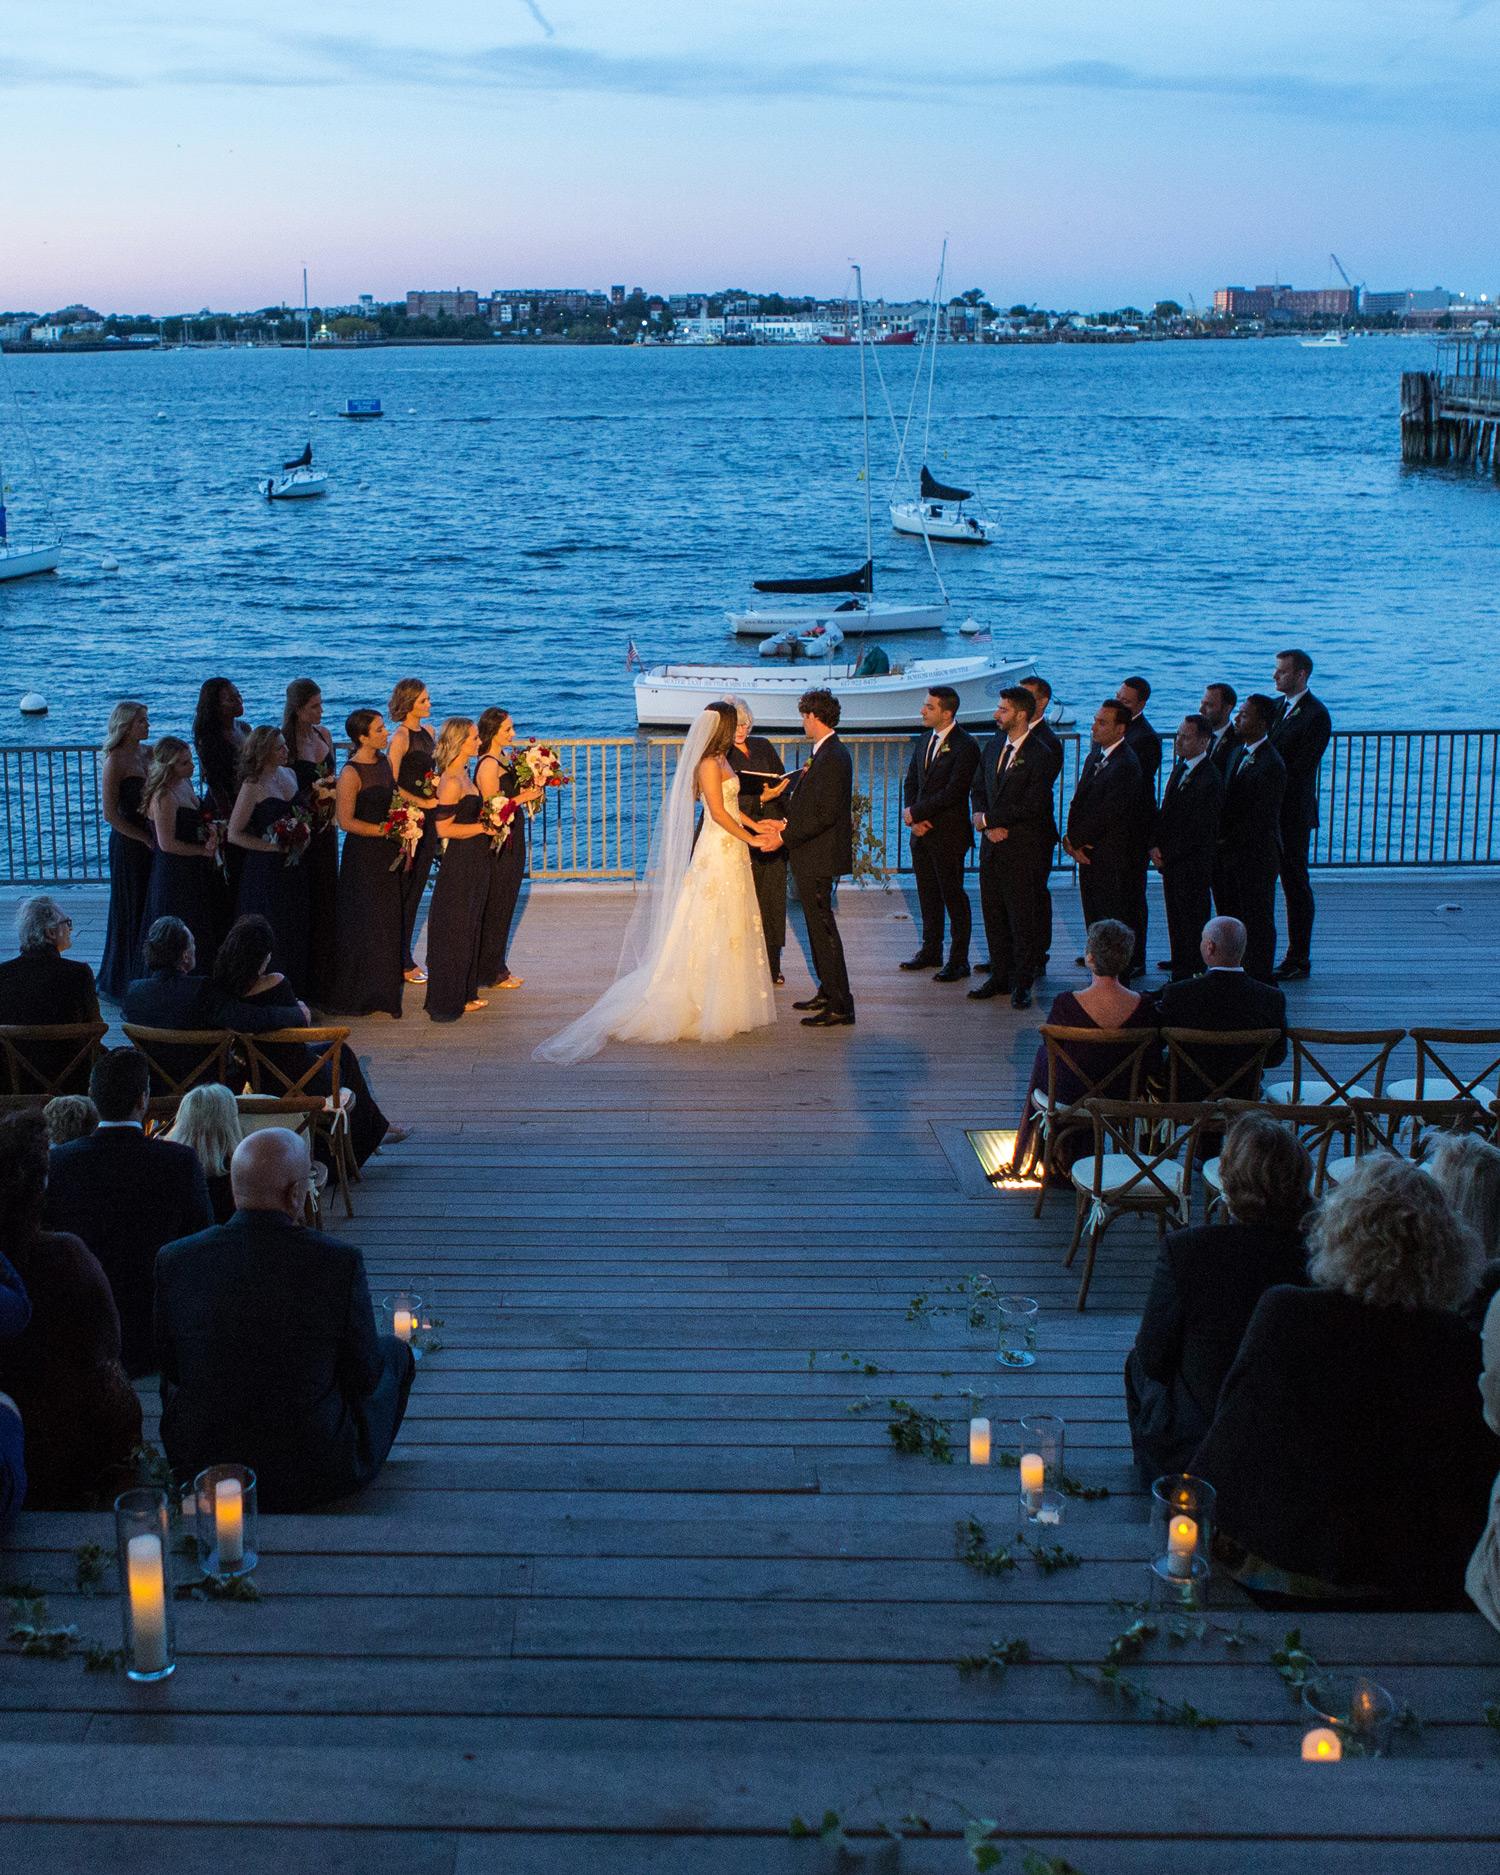 danielle-brian-wedding-ceremony-0916-s113001-0616.jpg